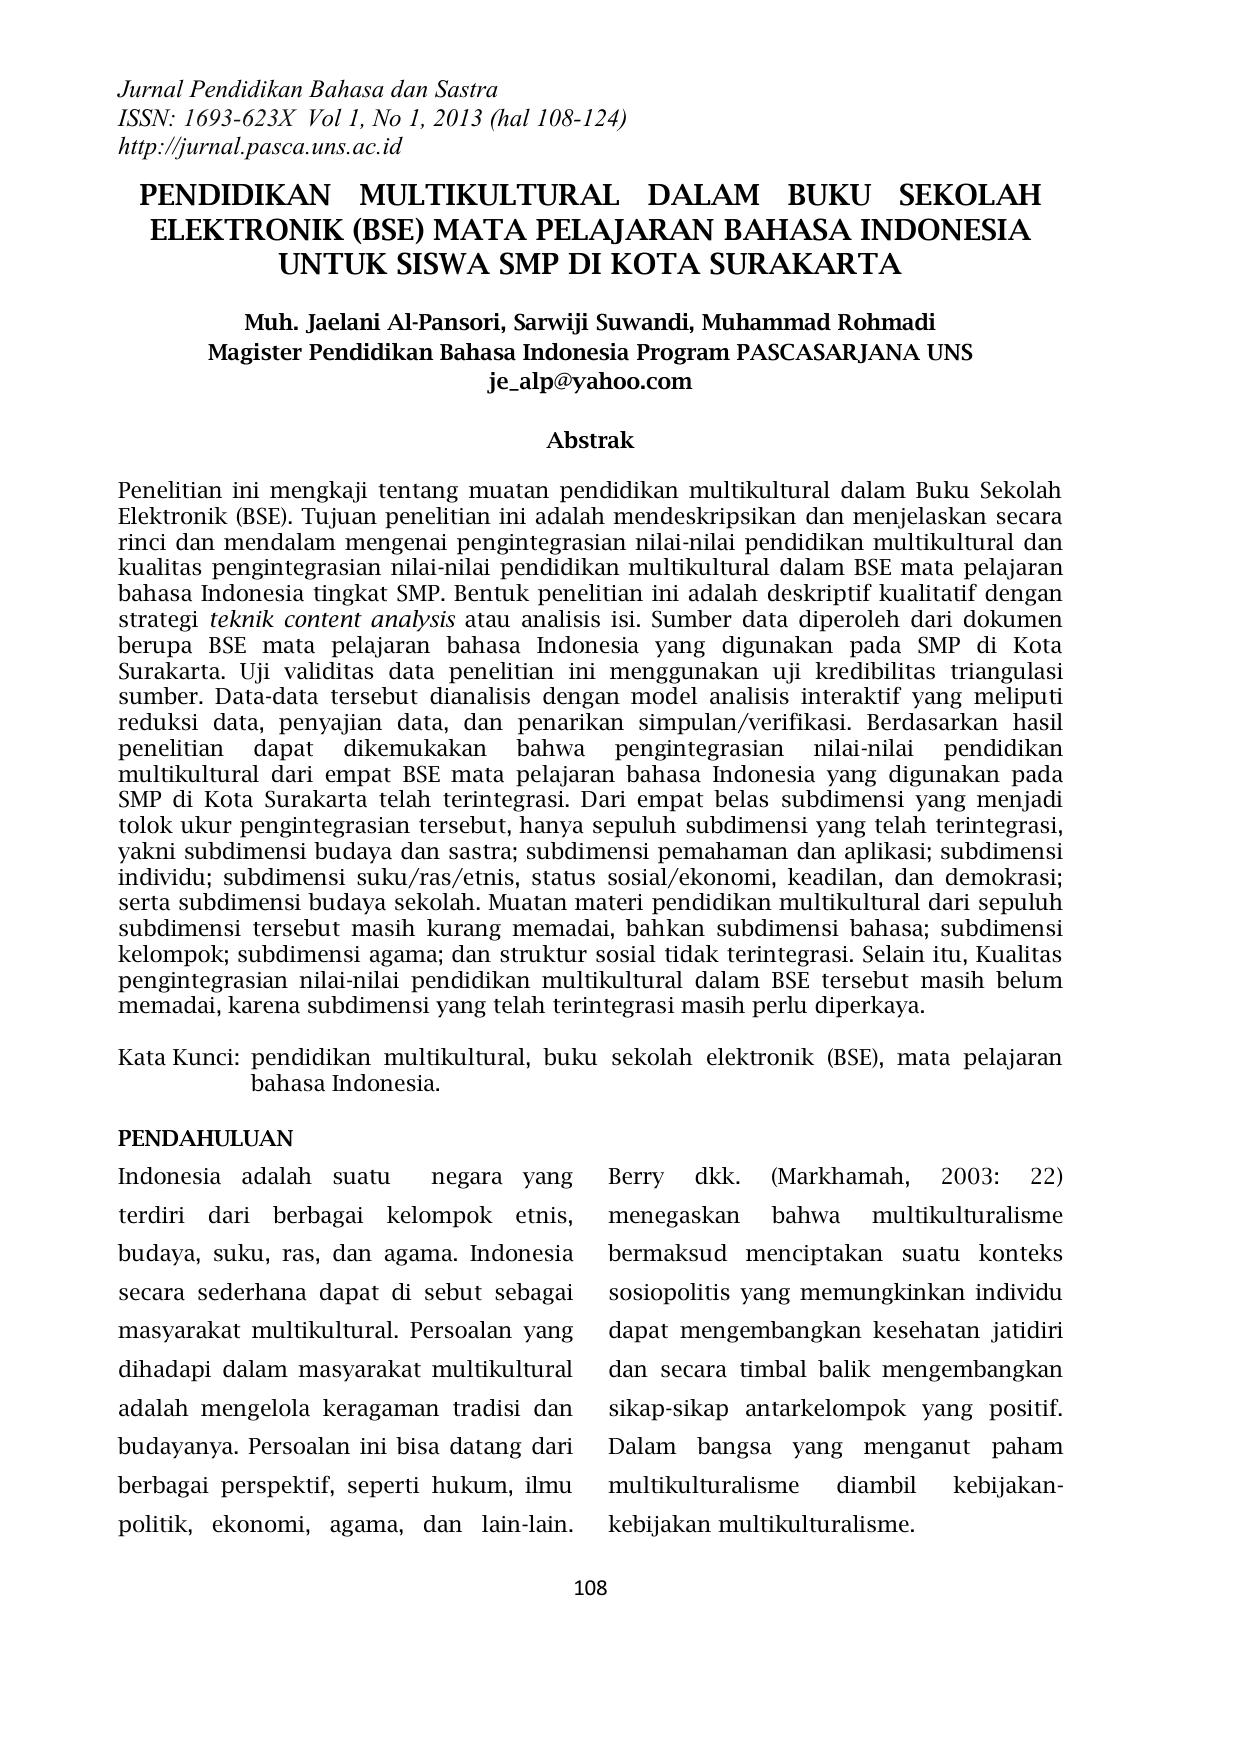 contoh essay mengenai pendidikan multikulturalisme yang diterapkan di indonesia